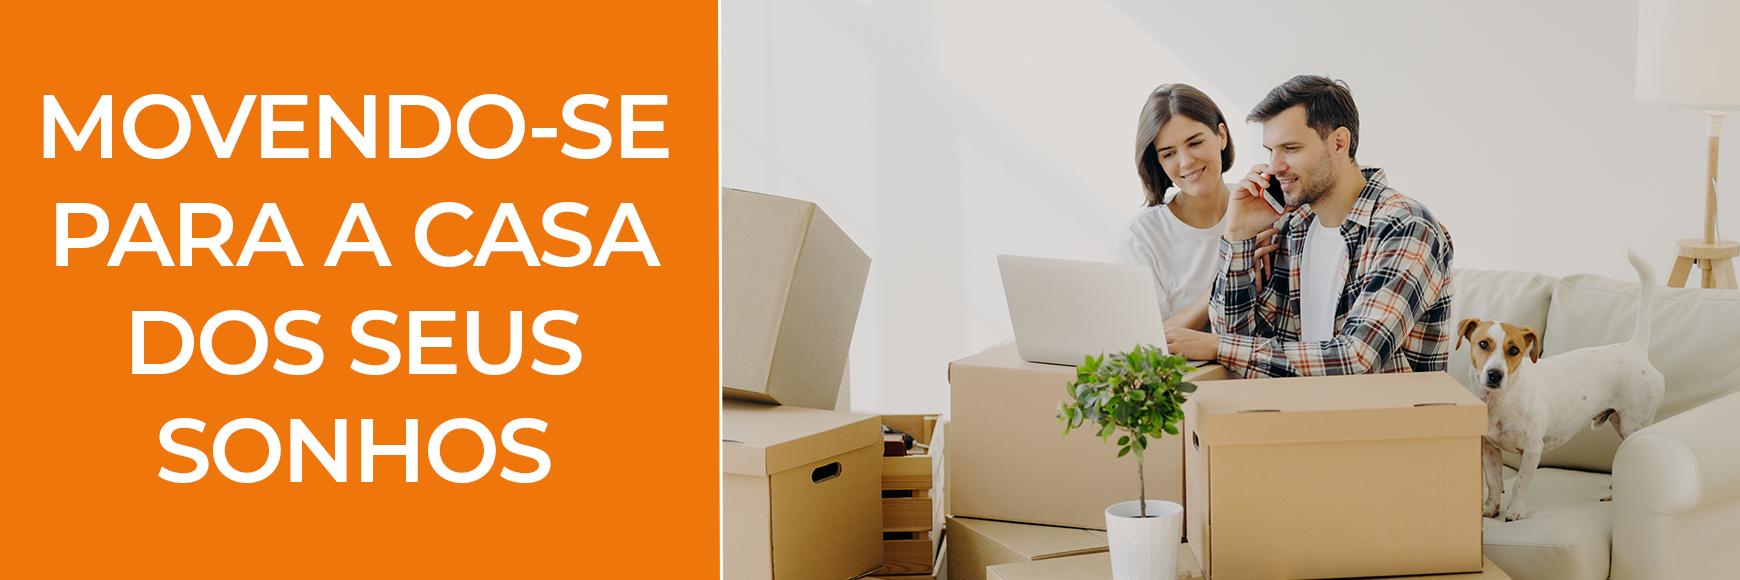 Movendo-se para a casa dos seus sonhos-Banner-Orlando Homes Sales